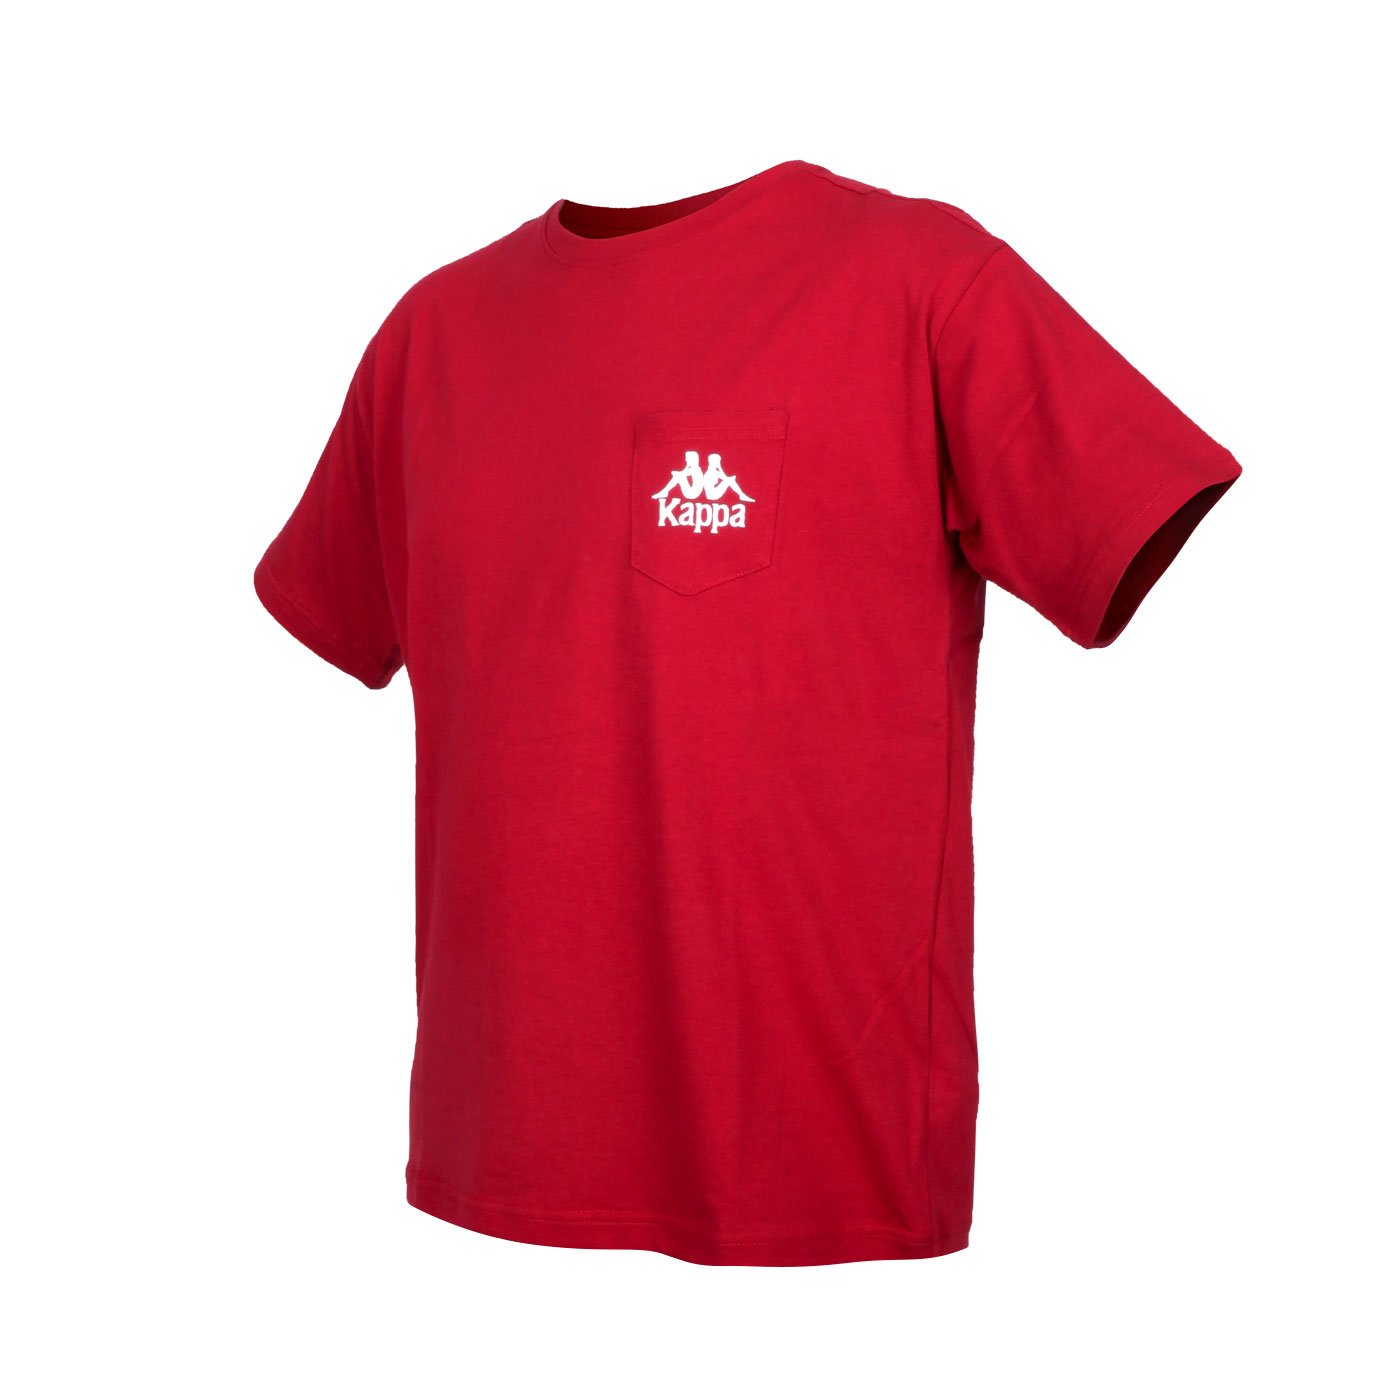 KAPPA 男款短袖T恤 32191TW-700